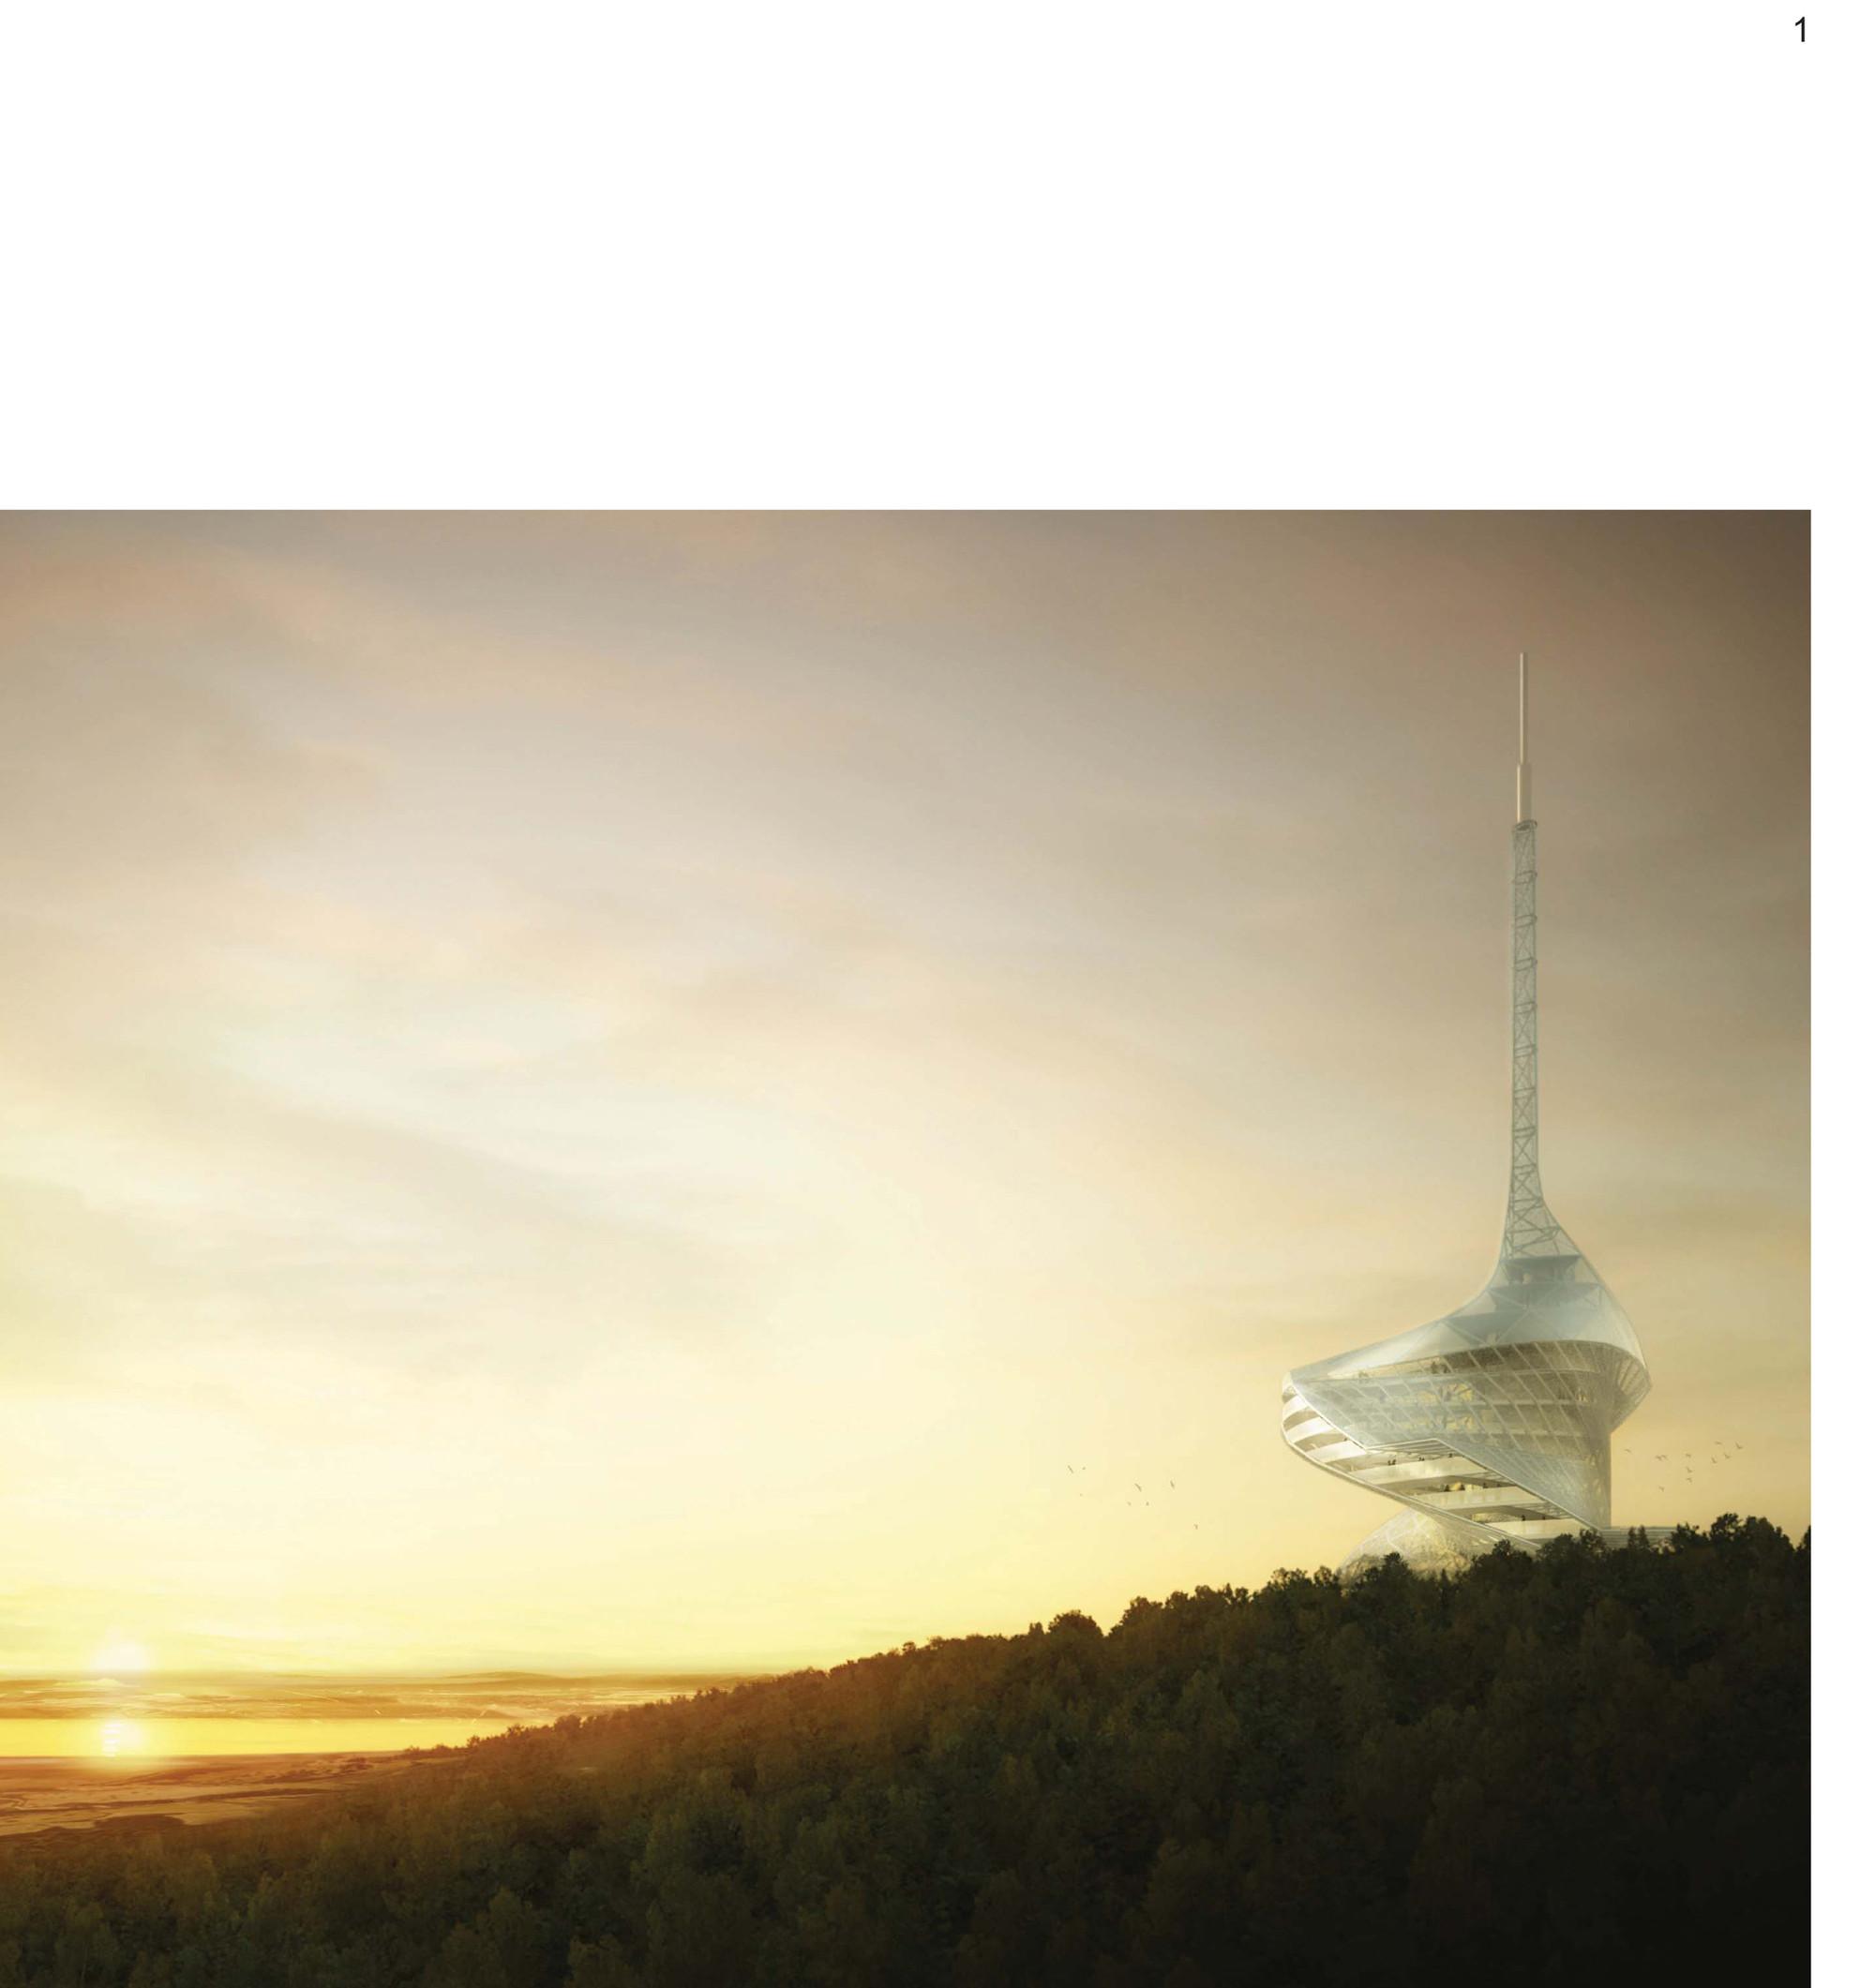 QUINTA MENCIÓN: Olaf Gipser Architects, Arup, DS Mimarlık. Imagen cortesía de Arkitera